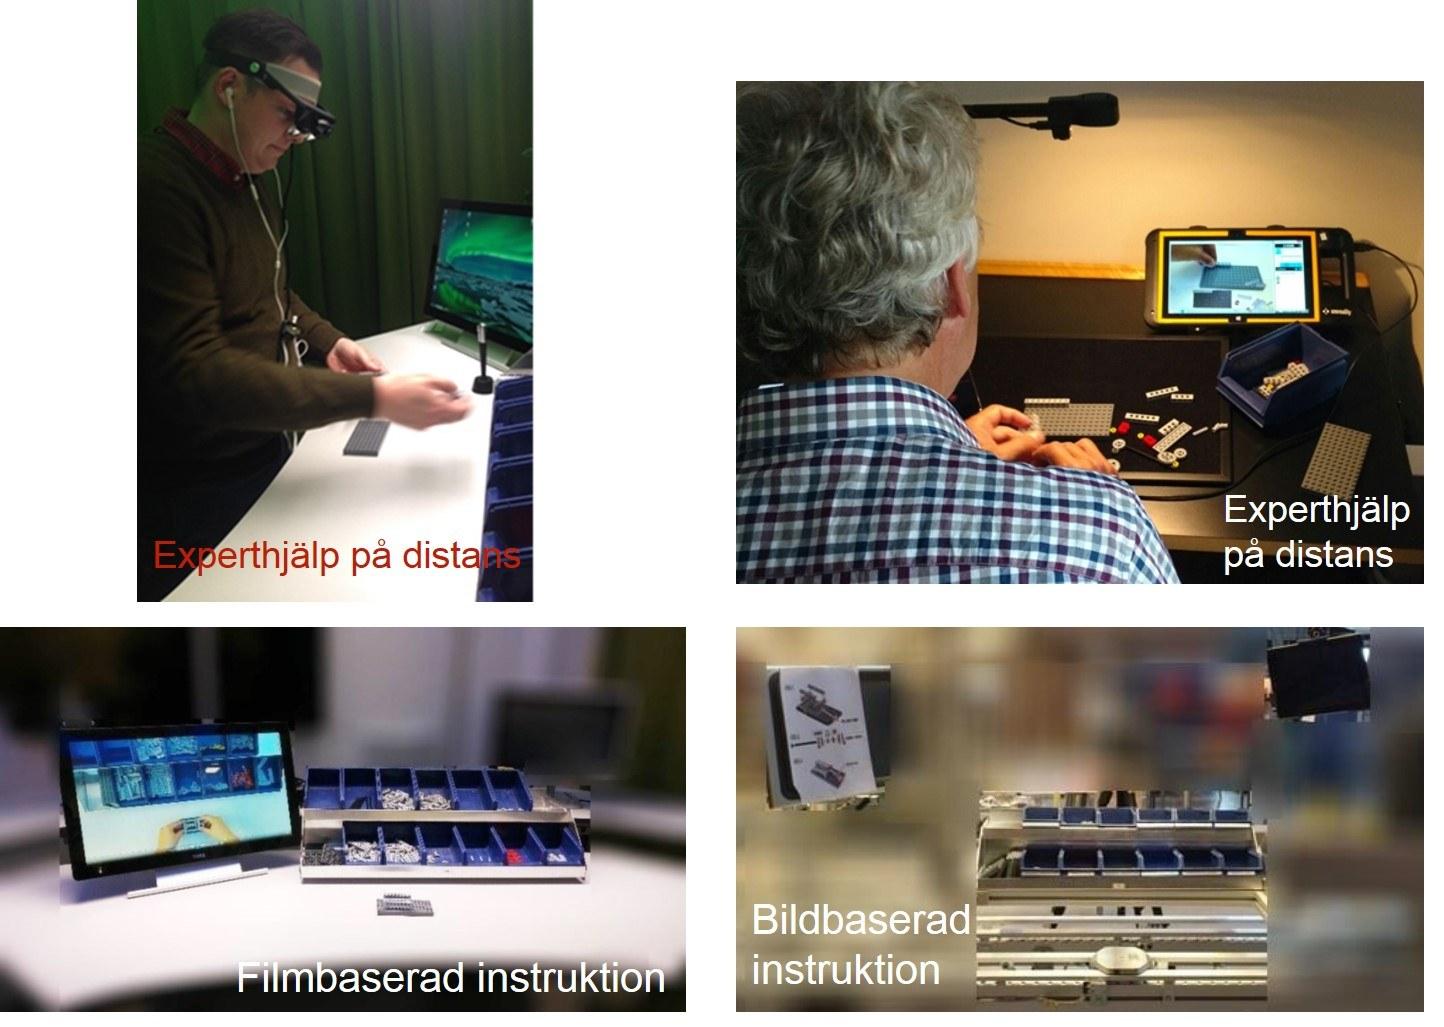 AR_Fallstudie-b_olika-tekniker.jpg#asset:208